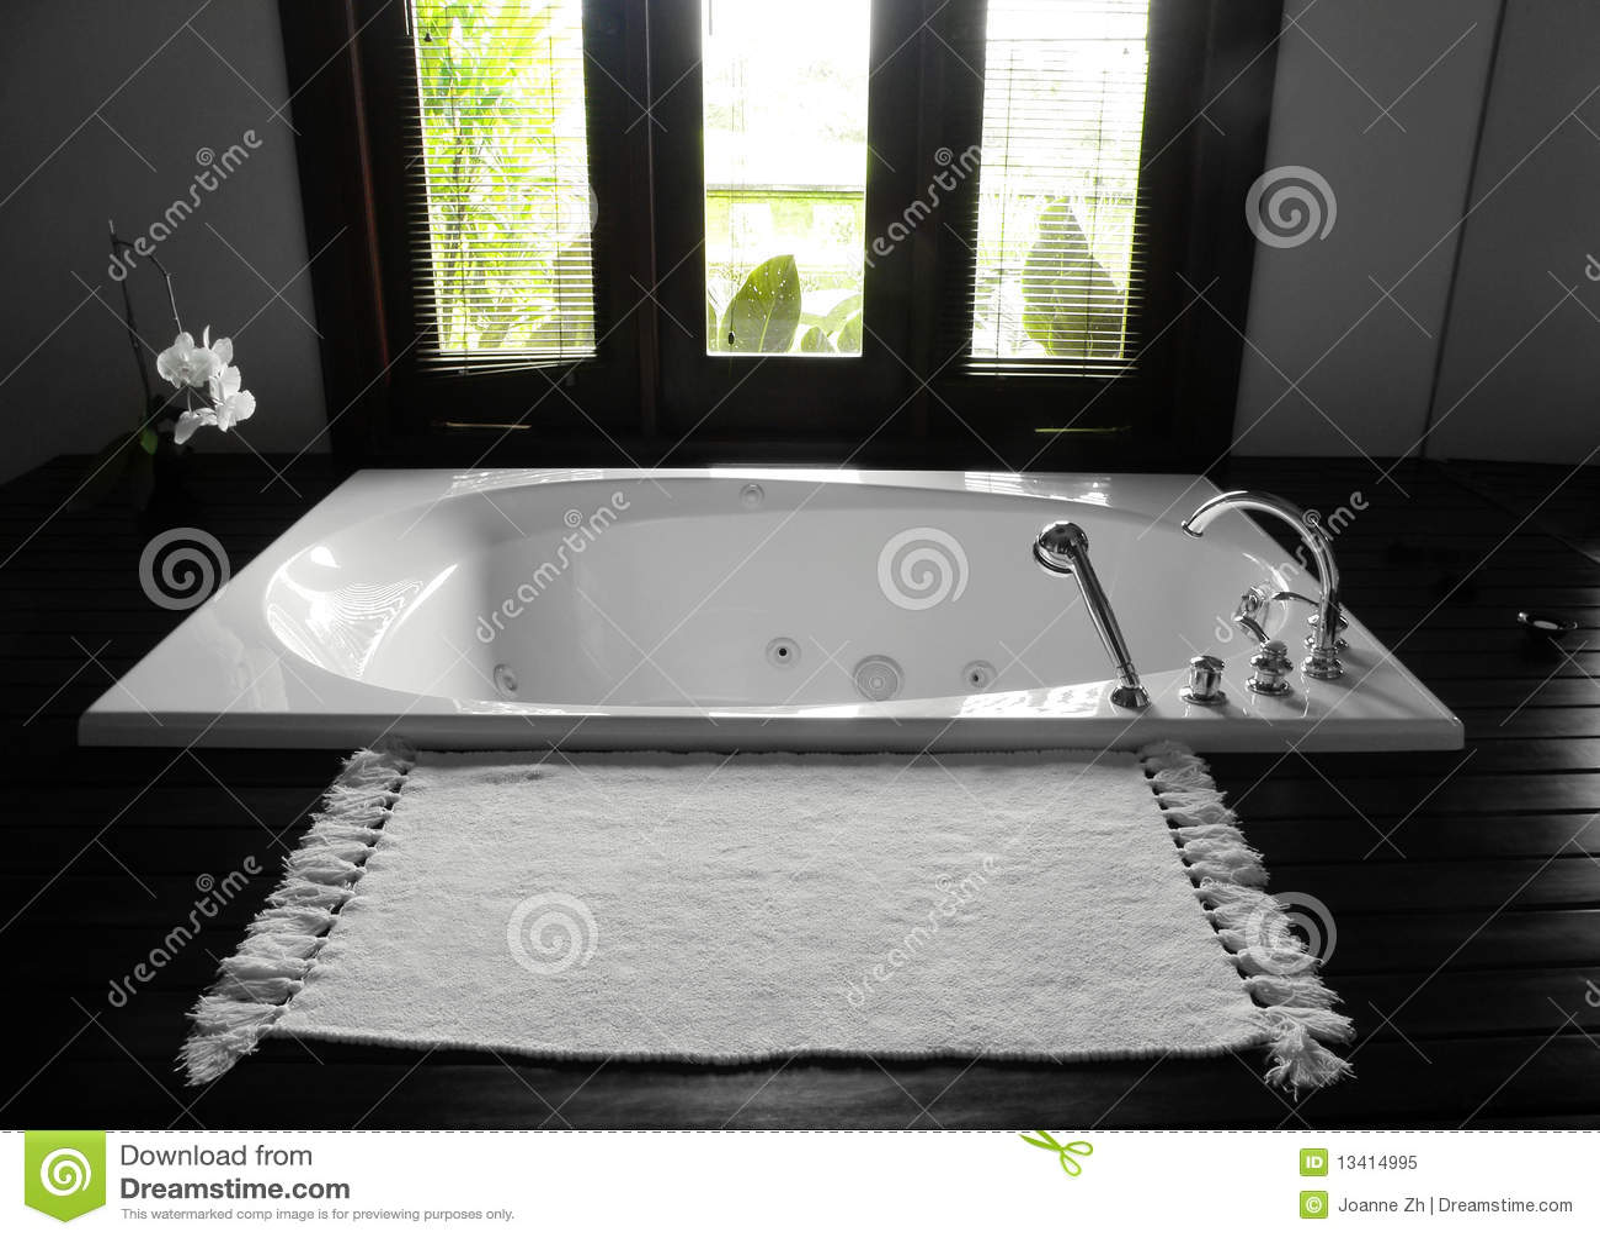 Bathroom bathtub, luxurious interior